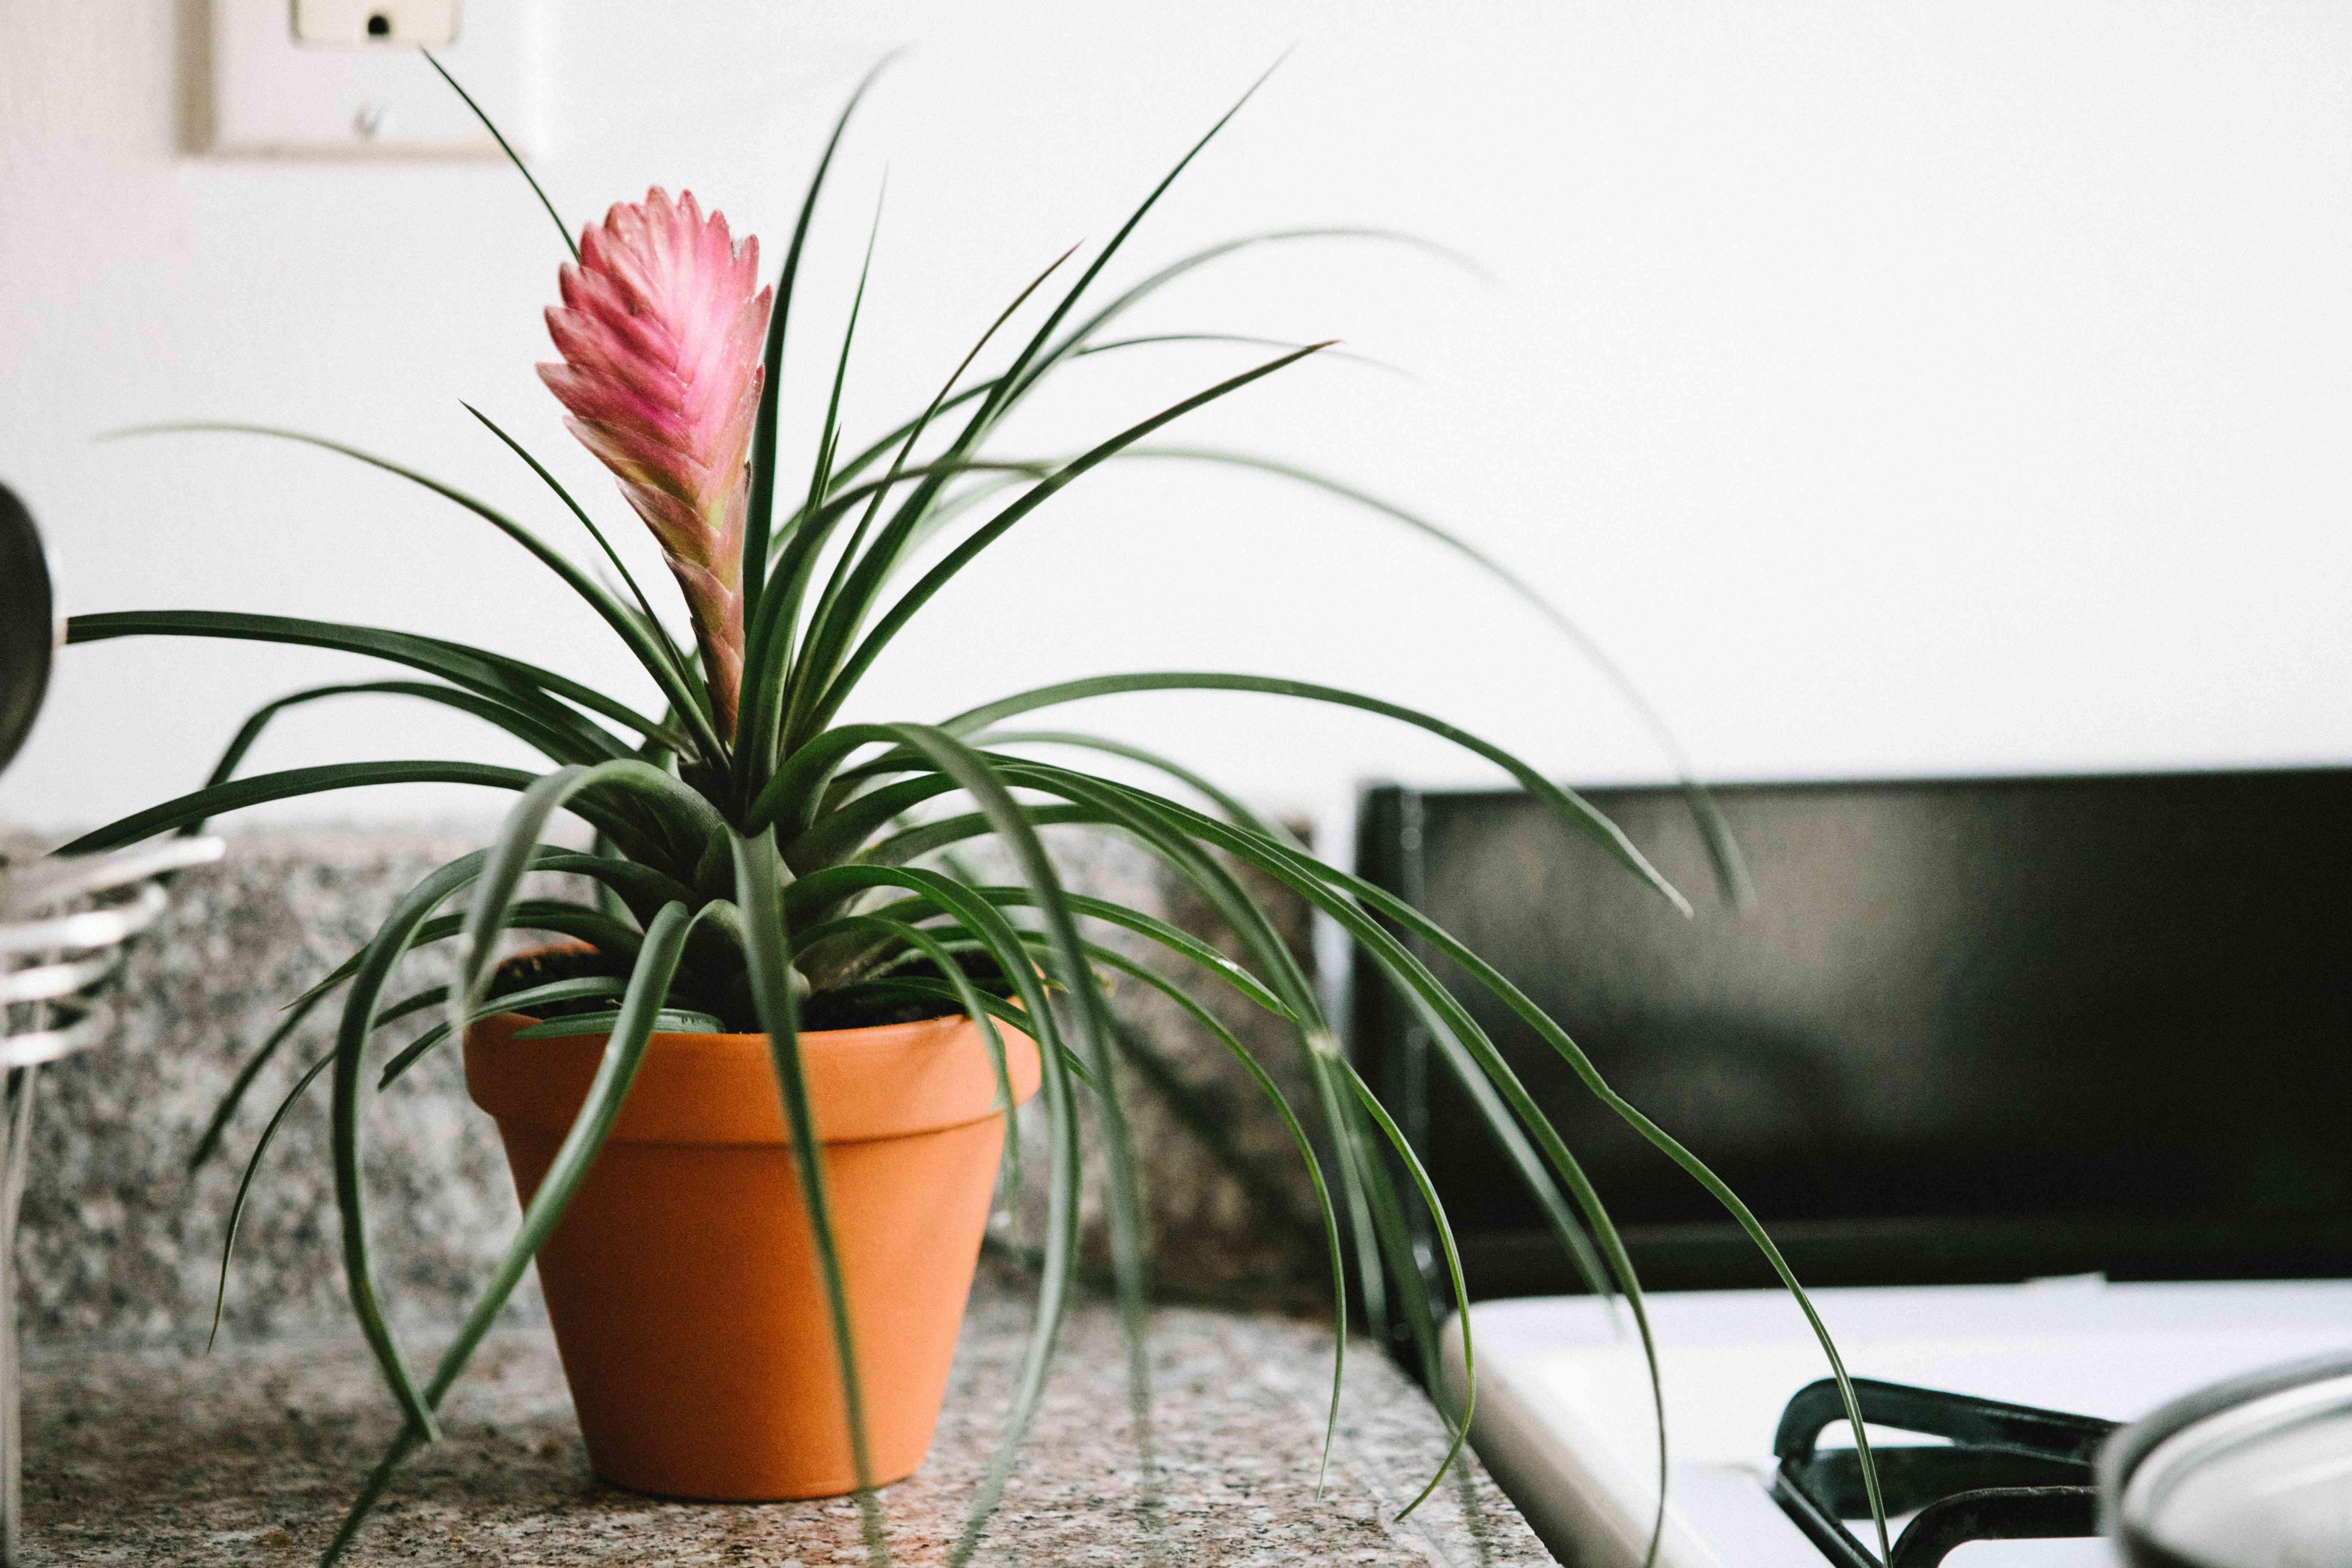 bromeliad plant next to oven range in kitchen